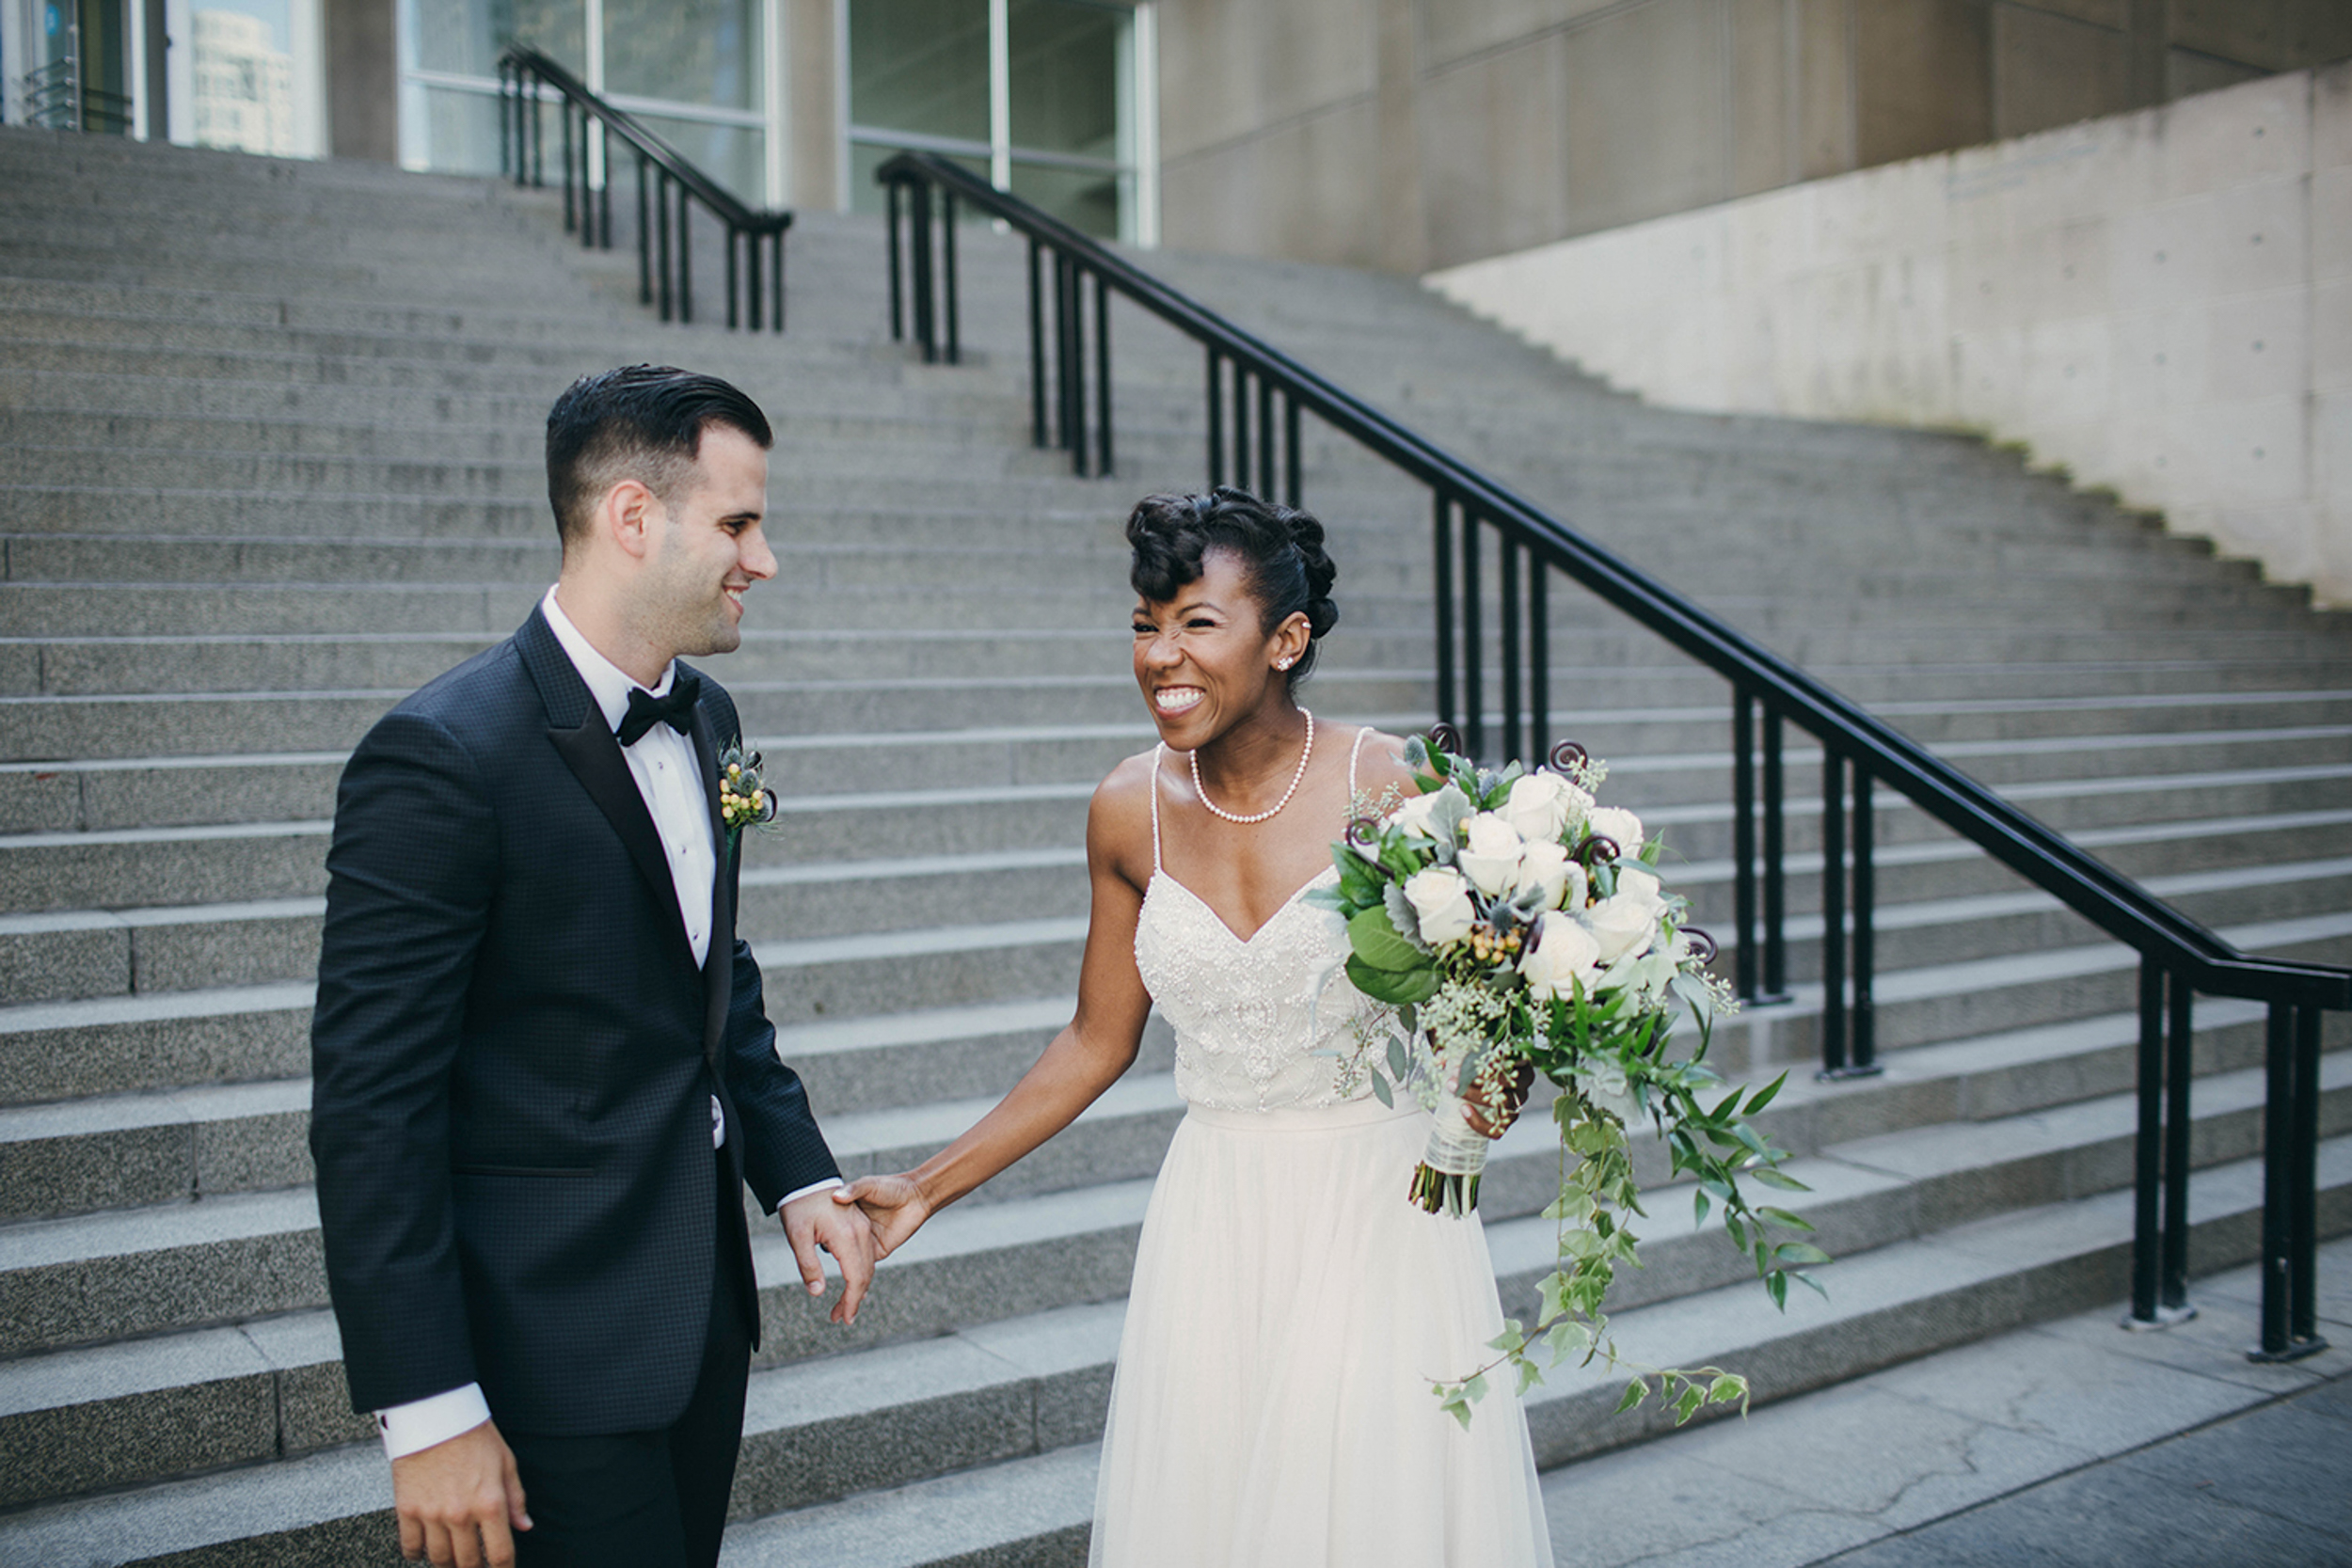 chicago.wedding.urban.intimate.zed451.lake.milton olive park-28.jpg